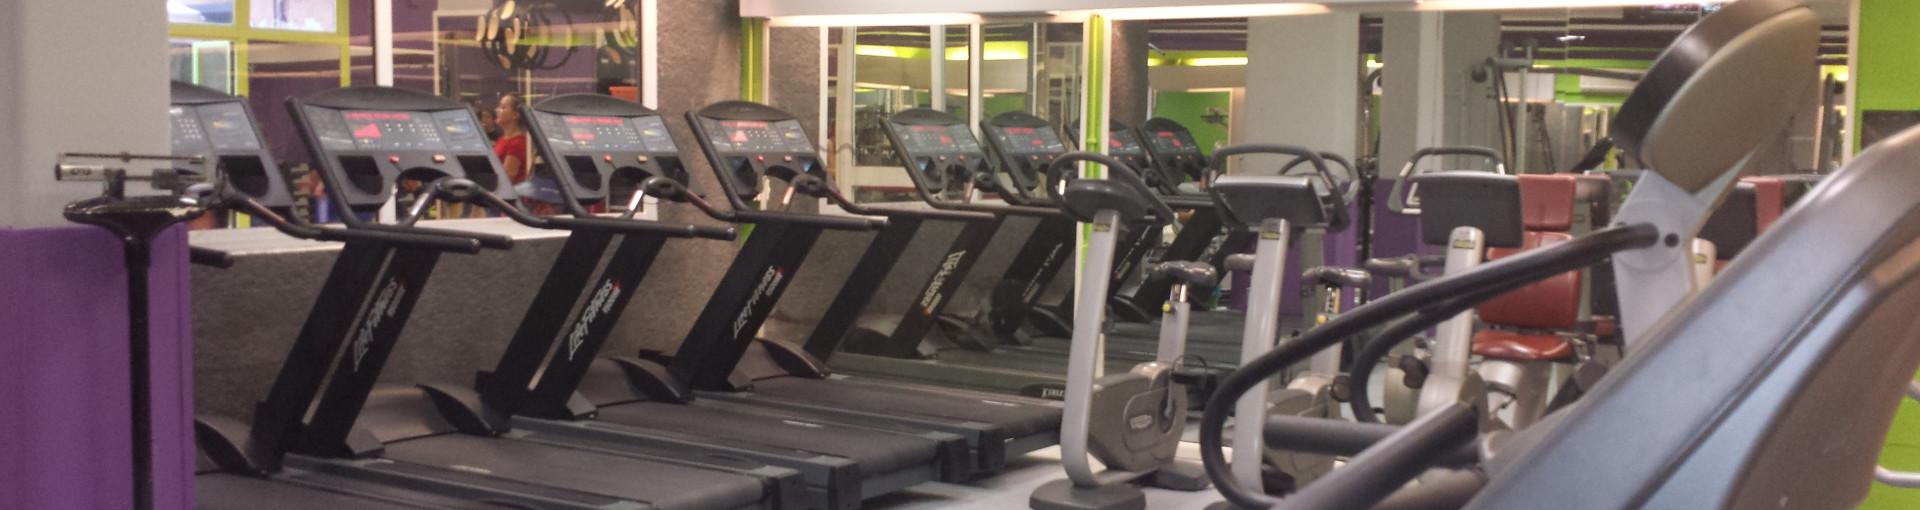 Crunch Fitness Club - Roma